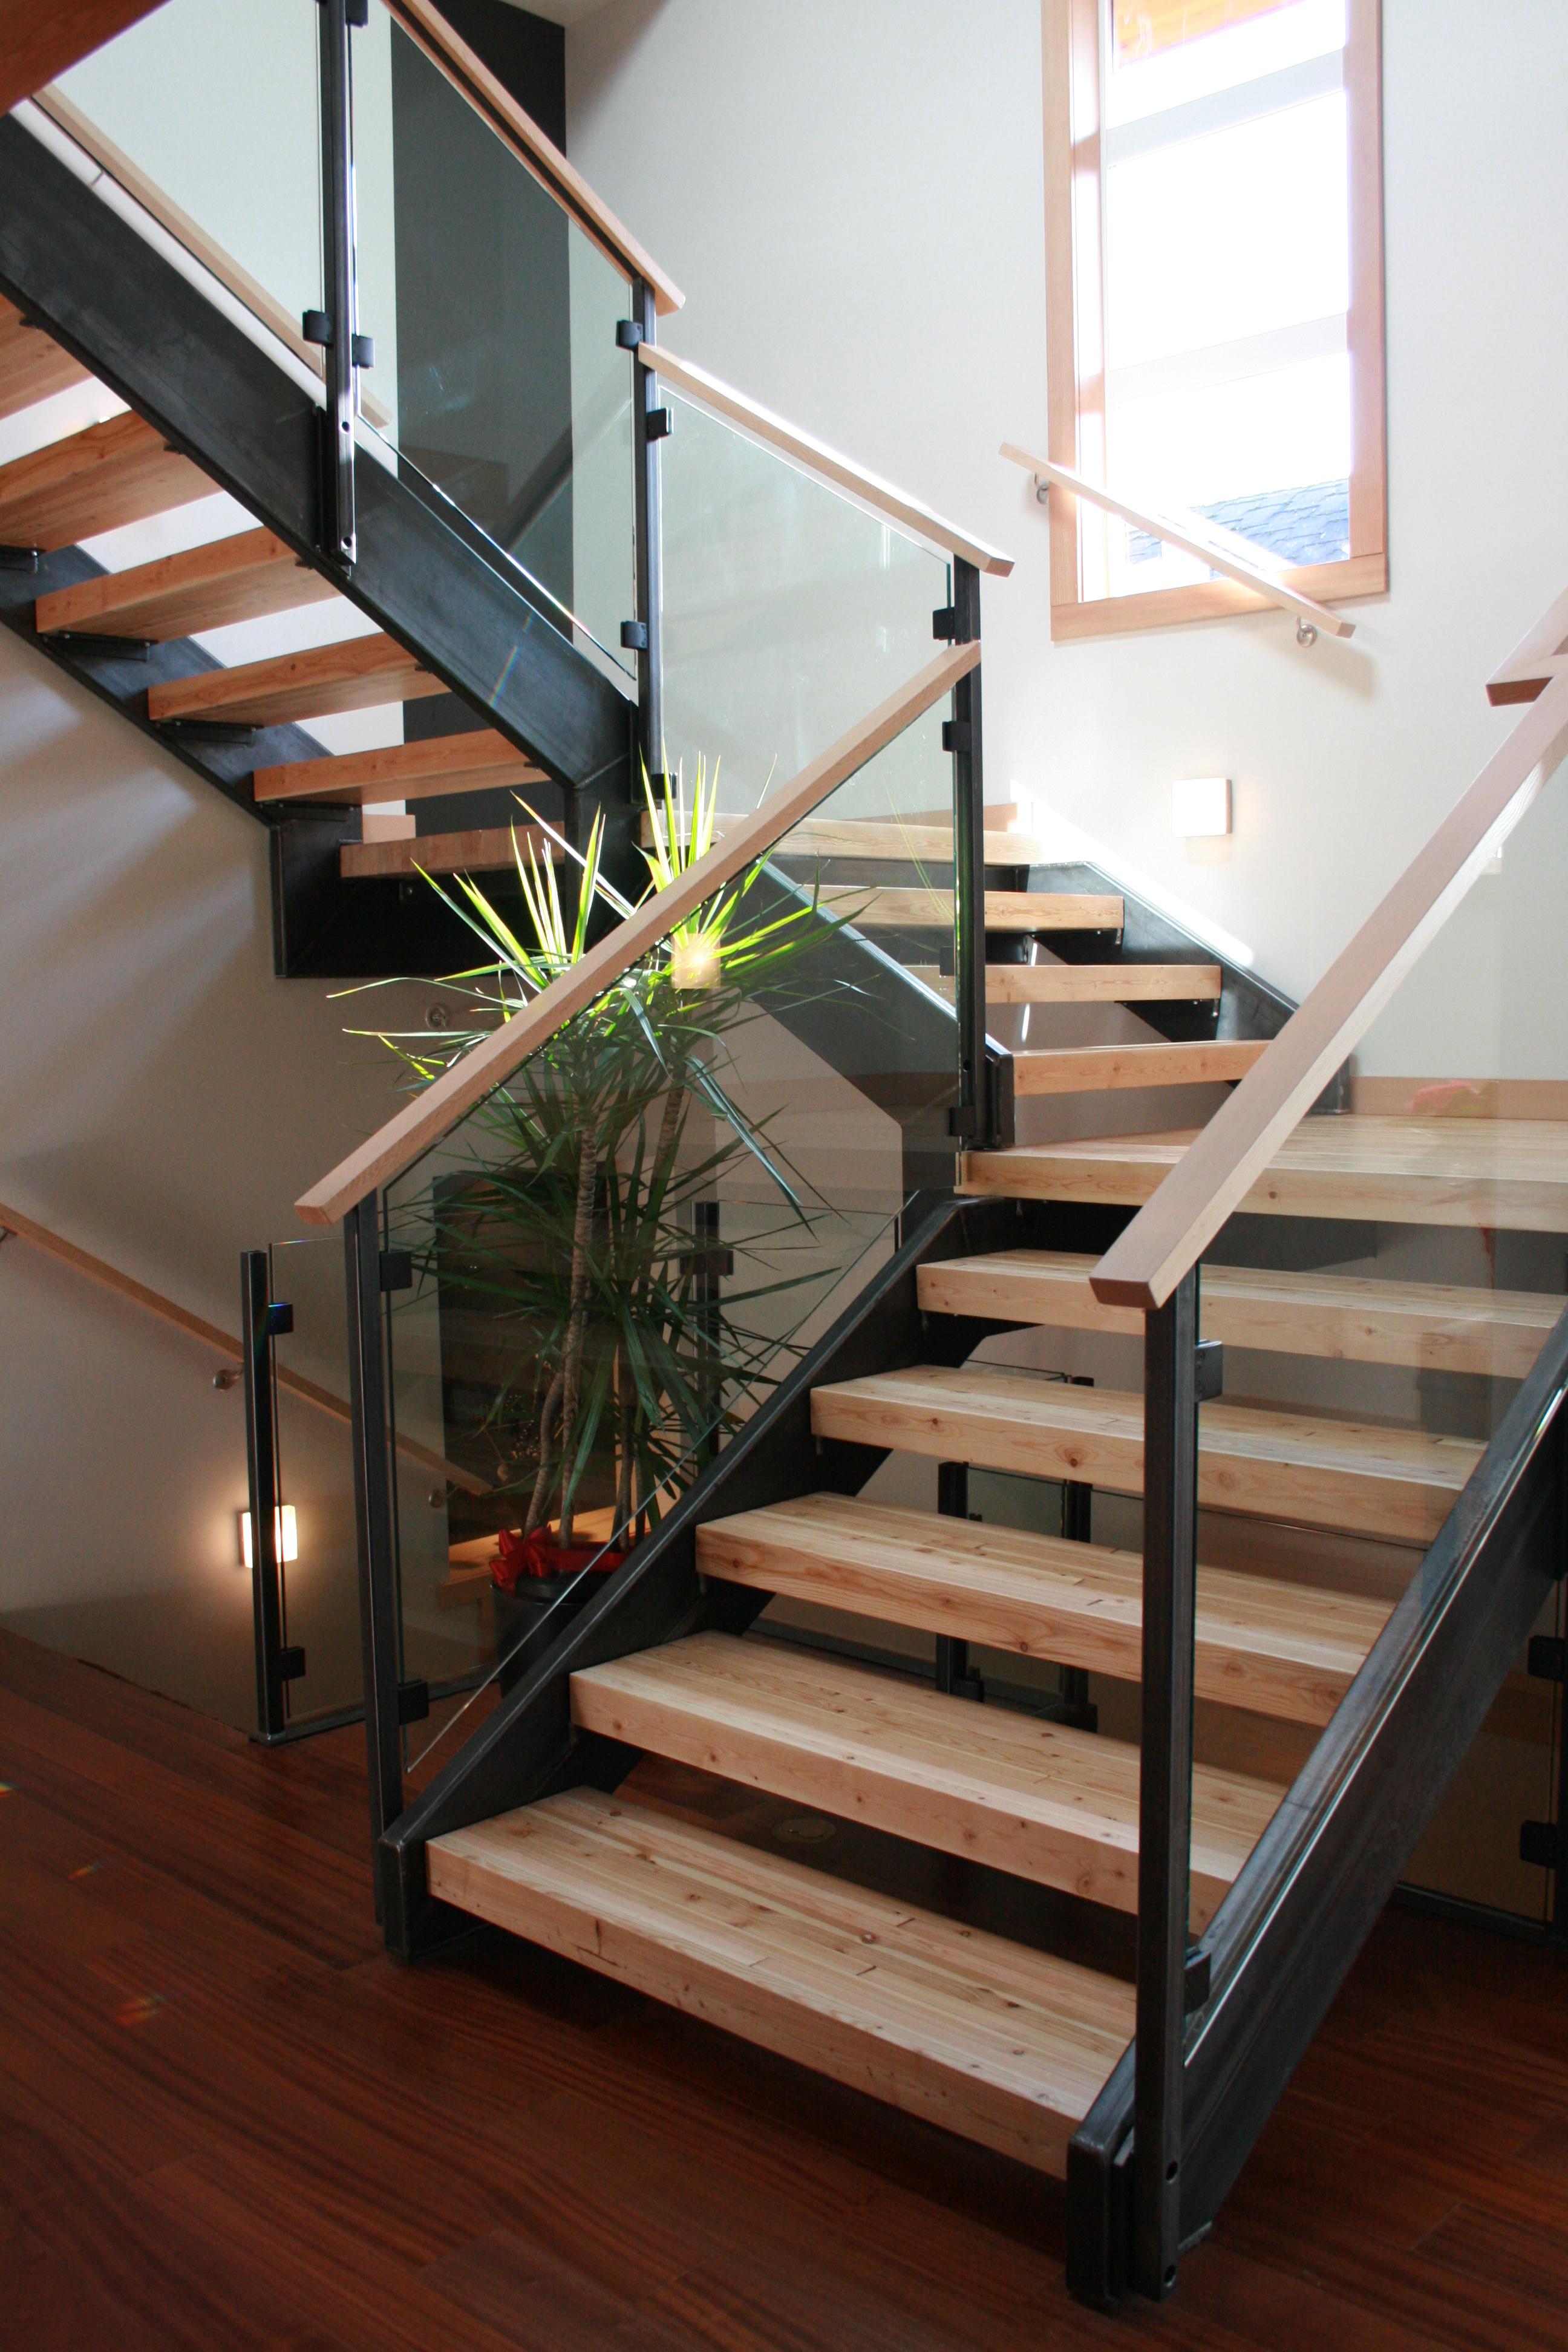 S T I Steeltec Industries Ltd Steel Stair Stringers